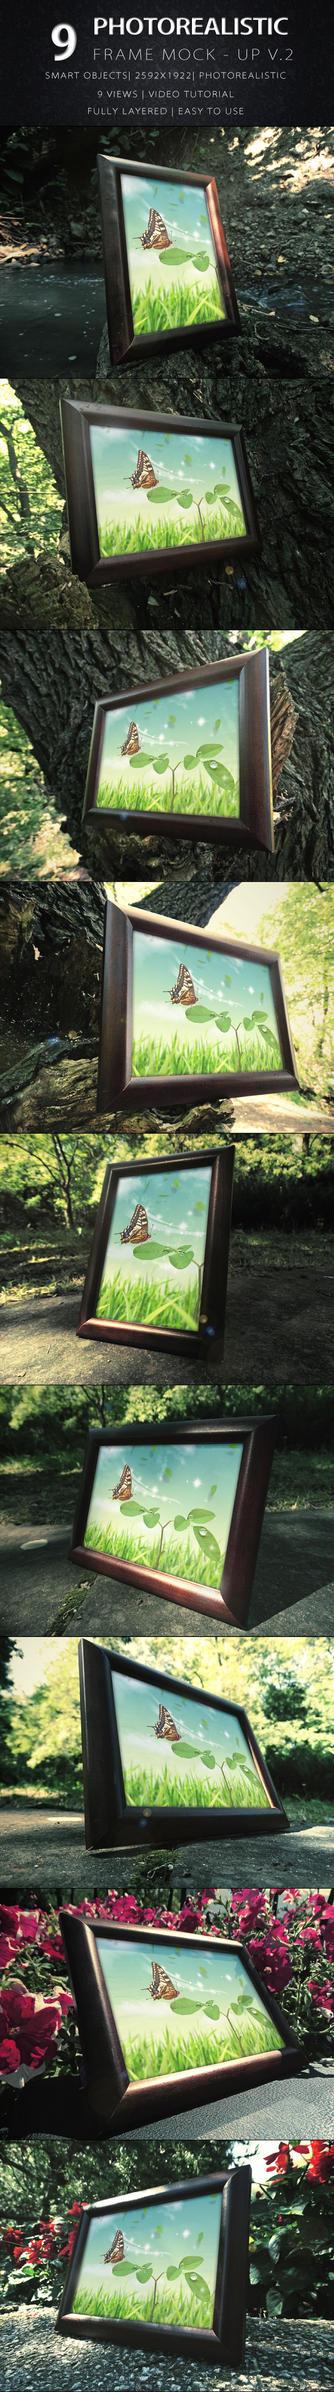 Photorealistic Frame Mock Up Vol.2 by KILVAM